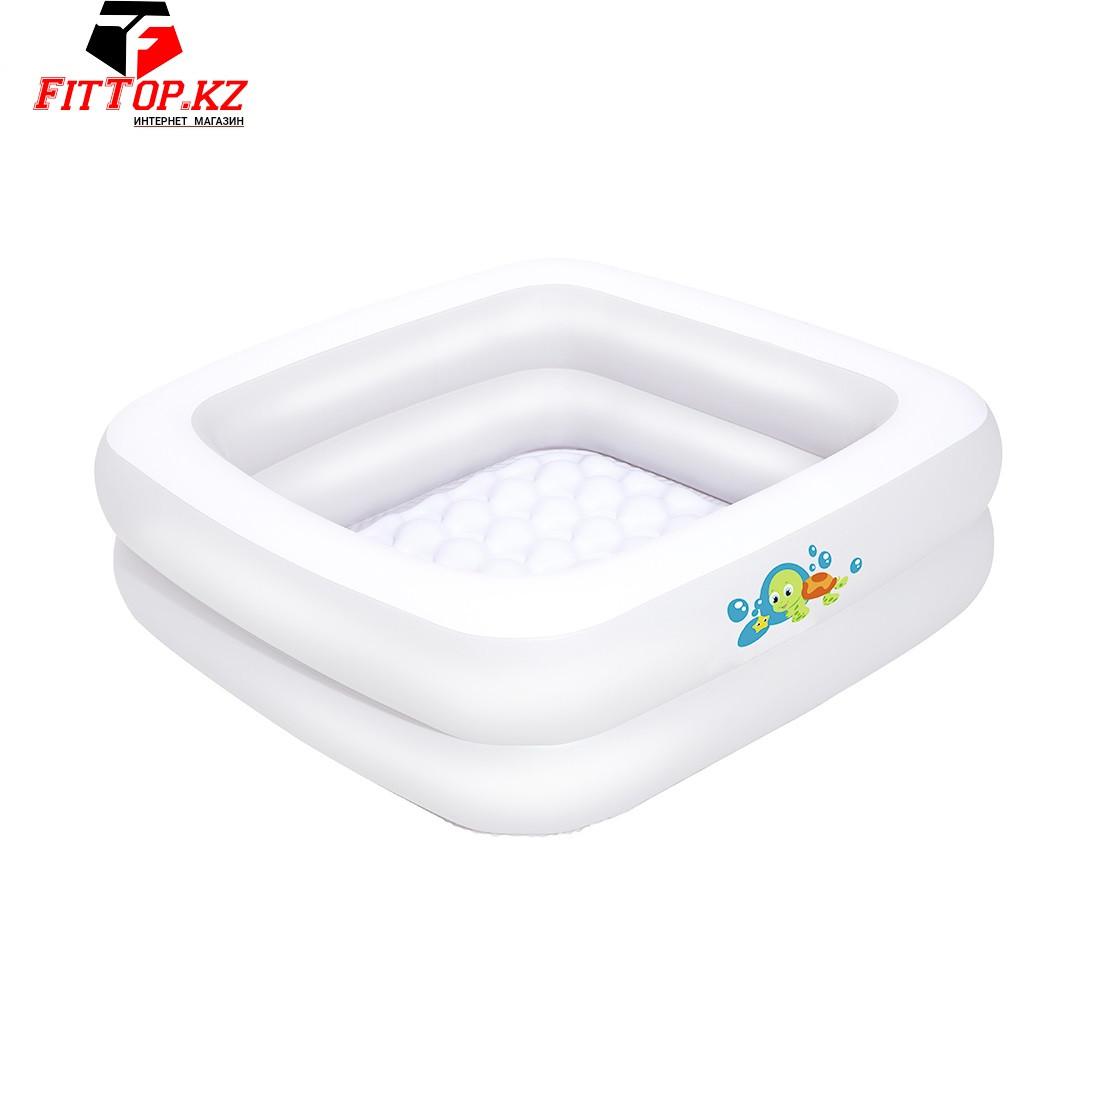 Детский надувной бассейн Baby Tub 86 х 86 х 25 см, BESTWAY, 51116